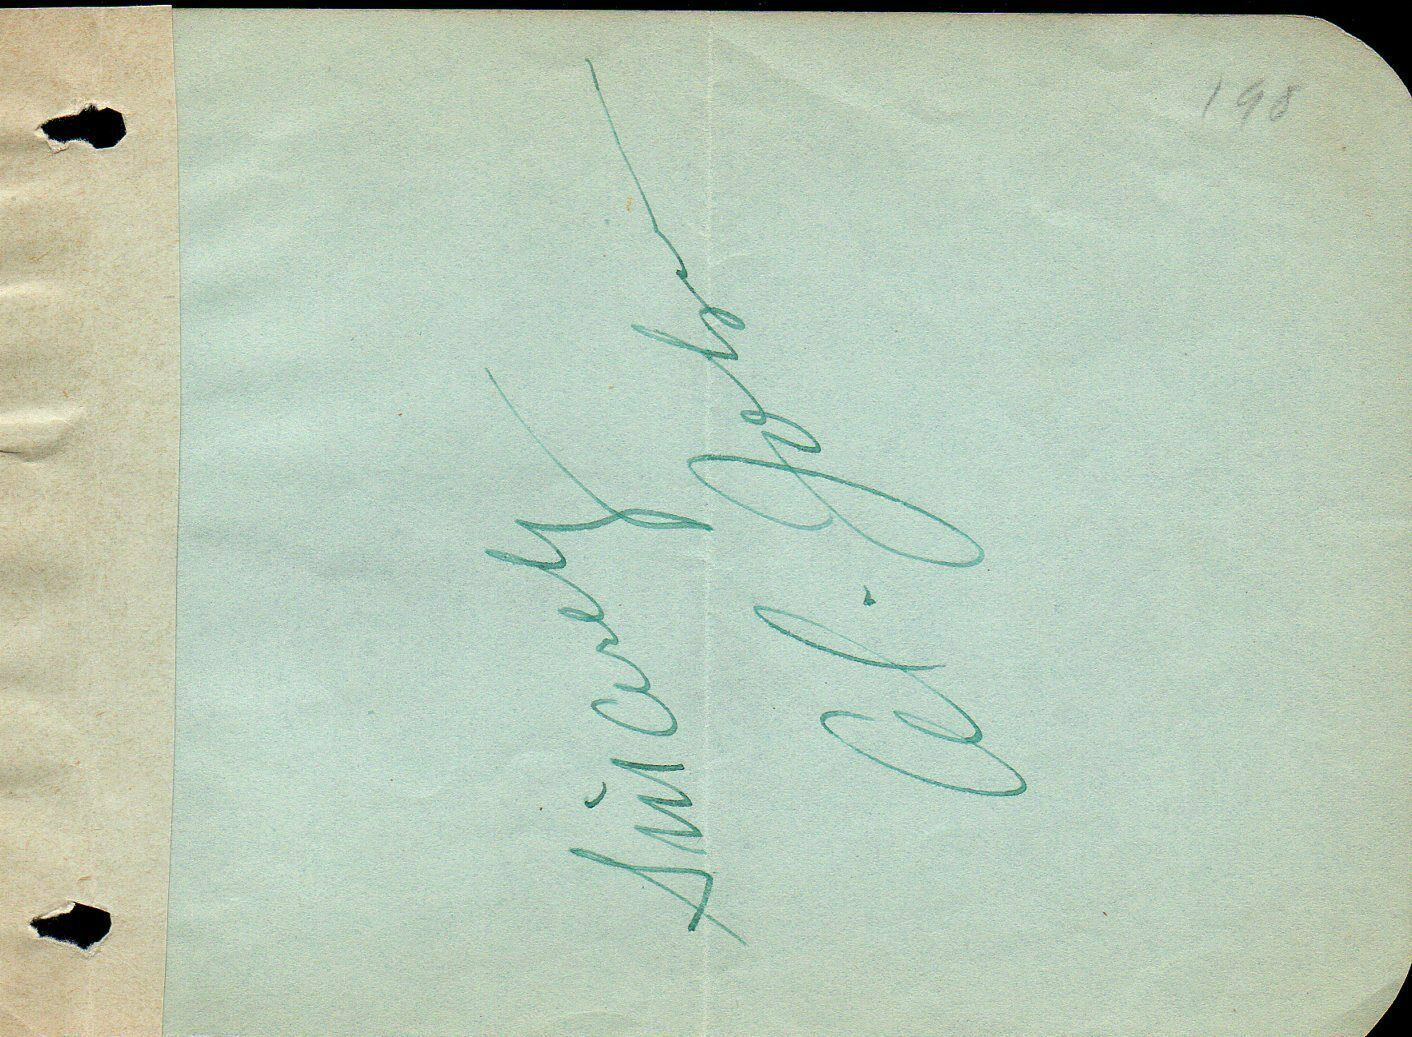 AL JOLSON Autograph. Signed on album page. The Jazz Singer